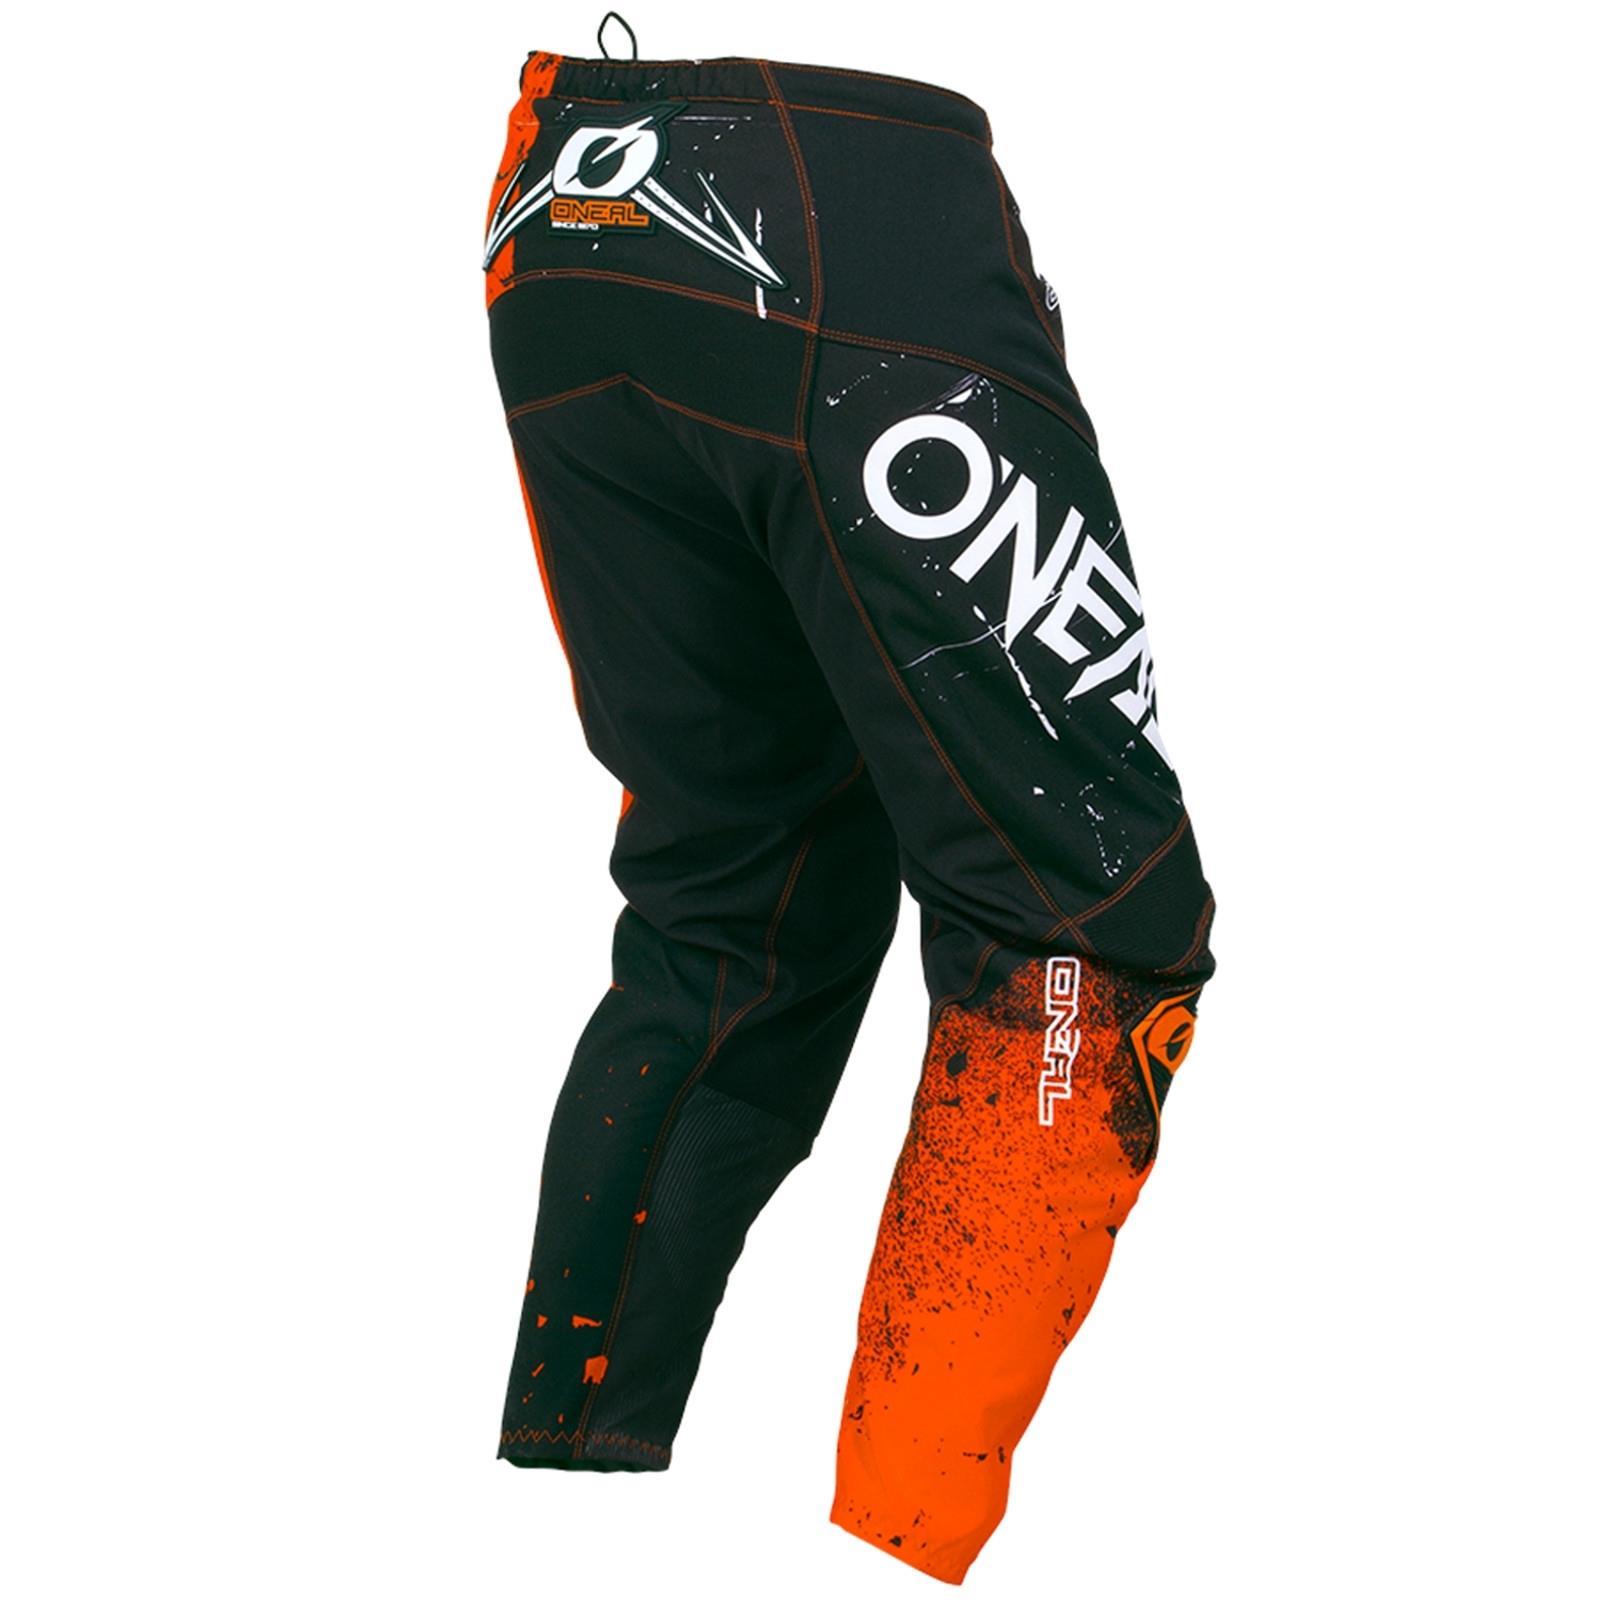 ONeal-pantalones-de-Jersey-de-los-ninos-de-pantalones-cortos-ninos-MX-bicicleta-DH-montana-bicicleta miniatura 115